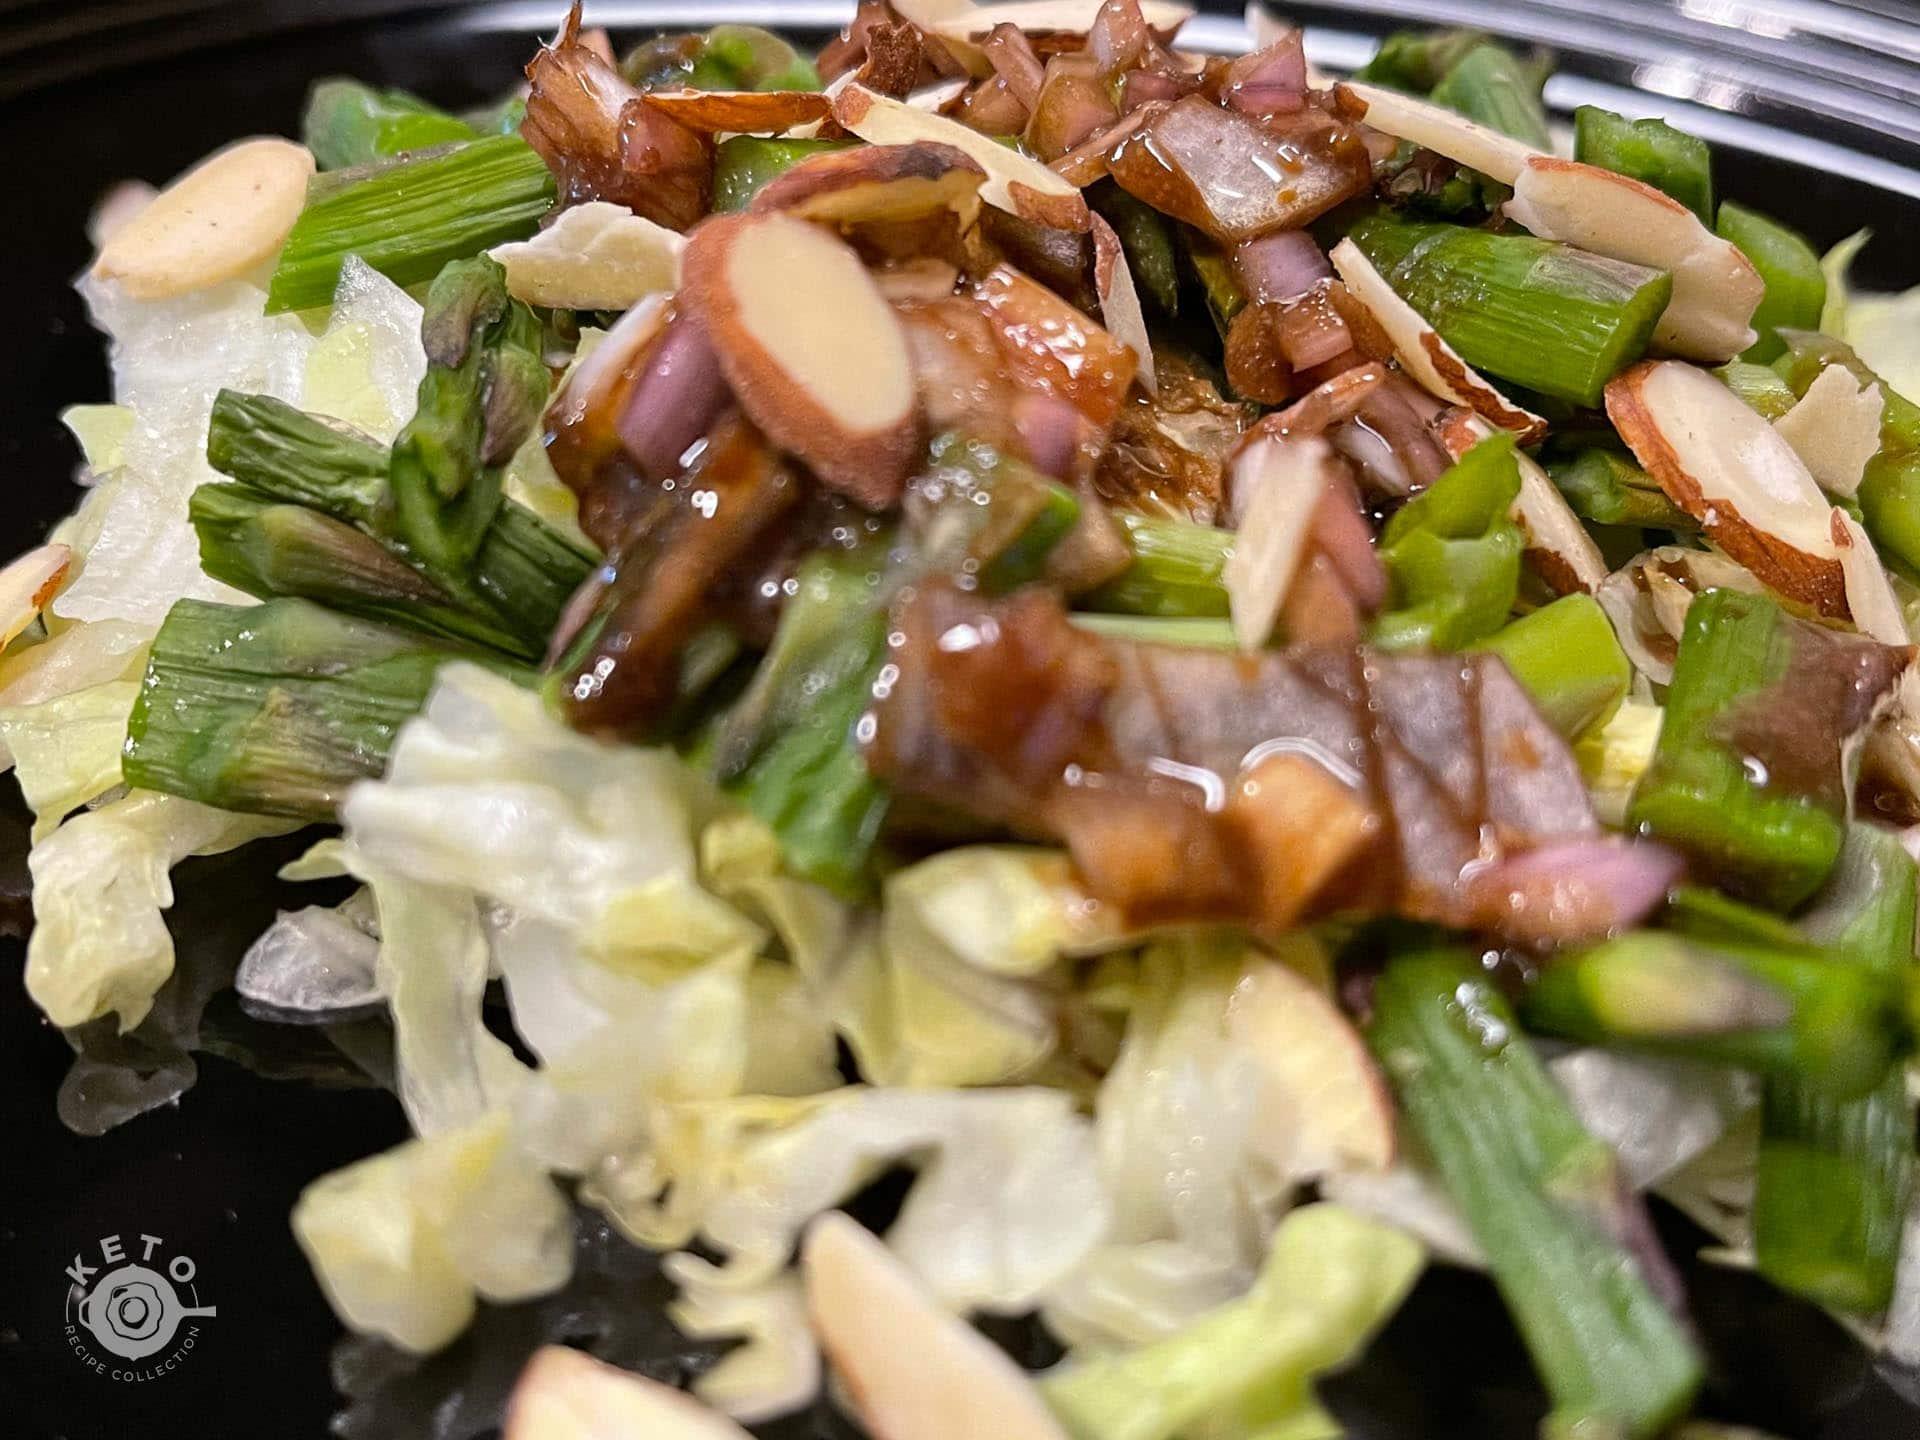 Keto Asparagus Salad with Slivered Almonds